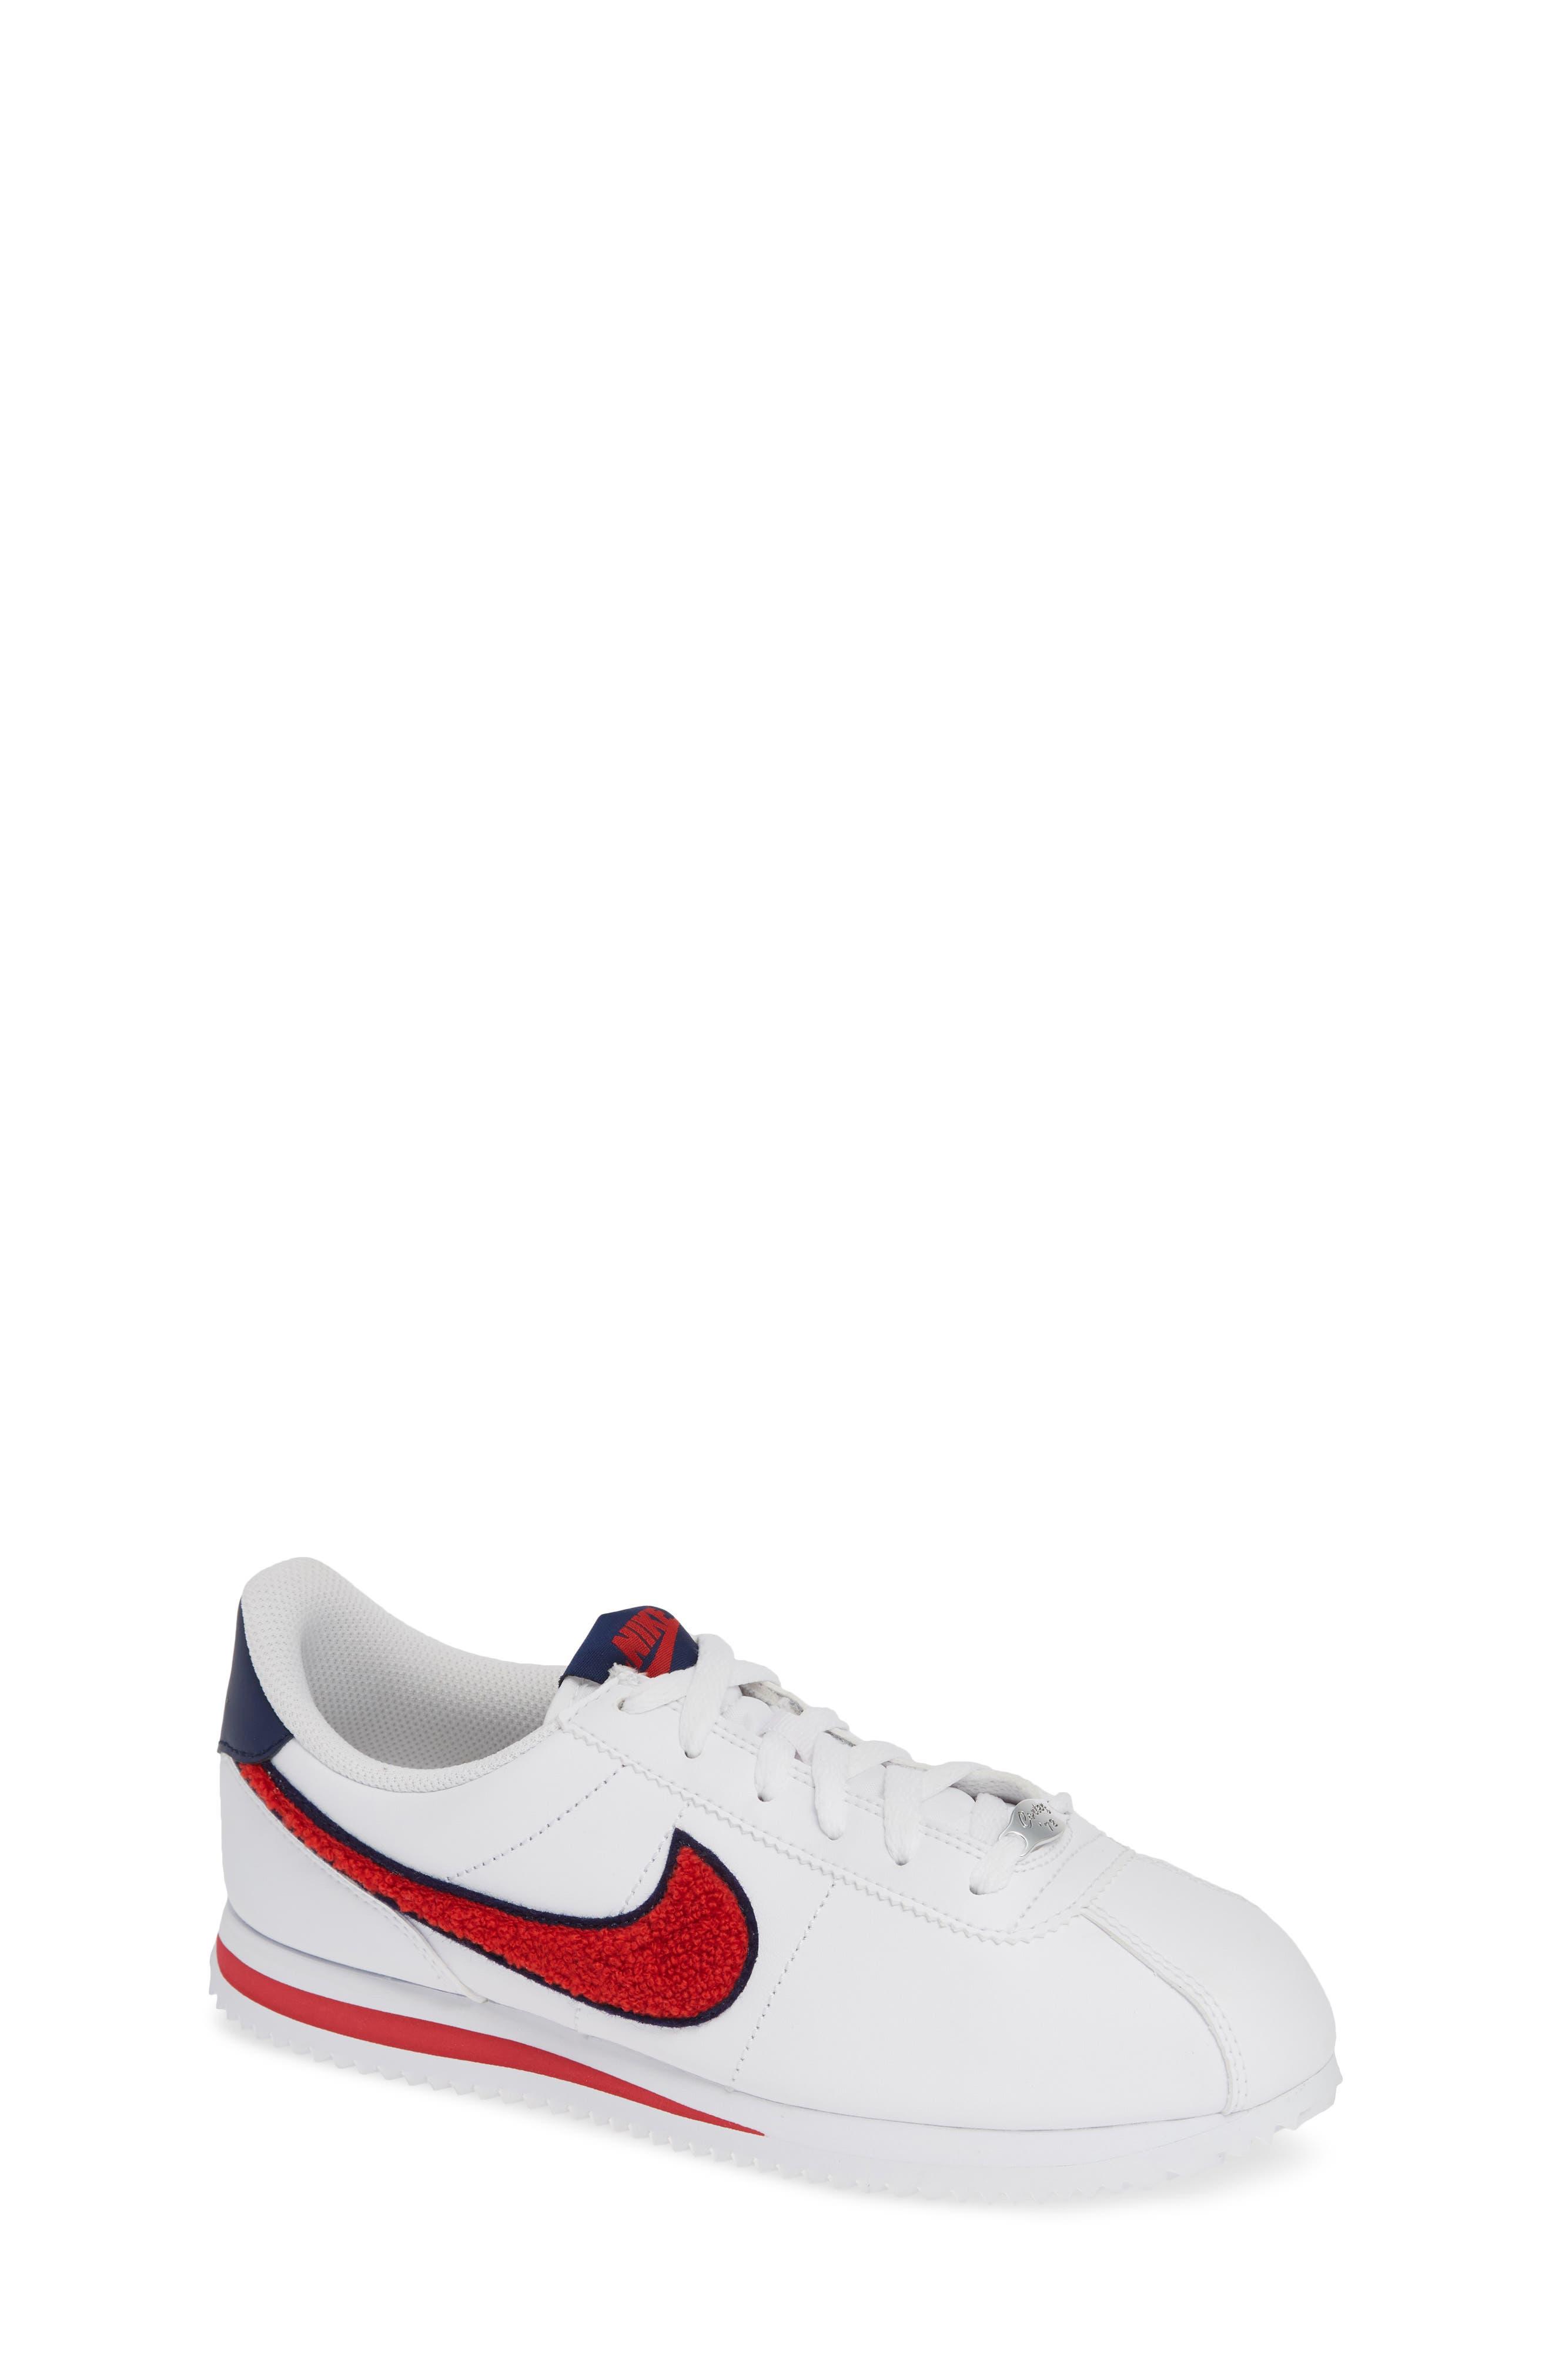 Cortez Basic SE Sneaker,                             Main thumbnail 1, color,                             WHITE/ UNIVERSITY RED/ BLUE